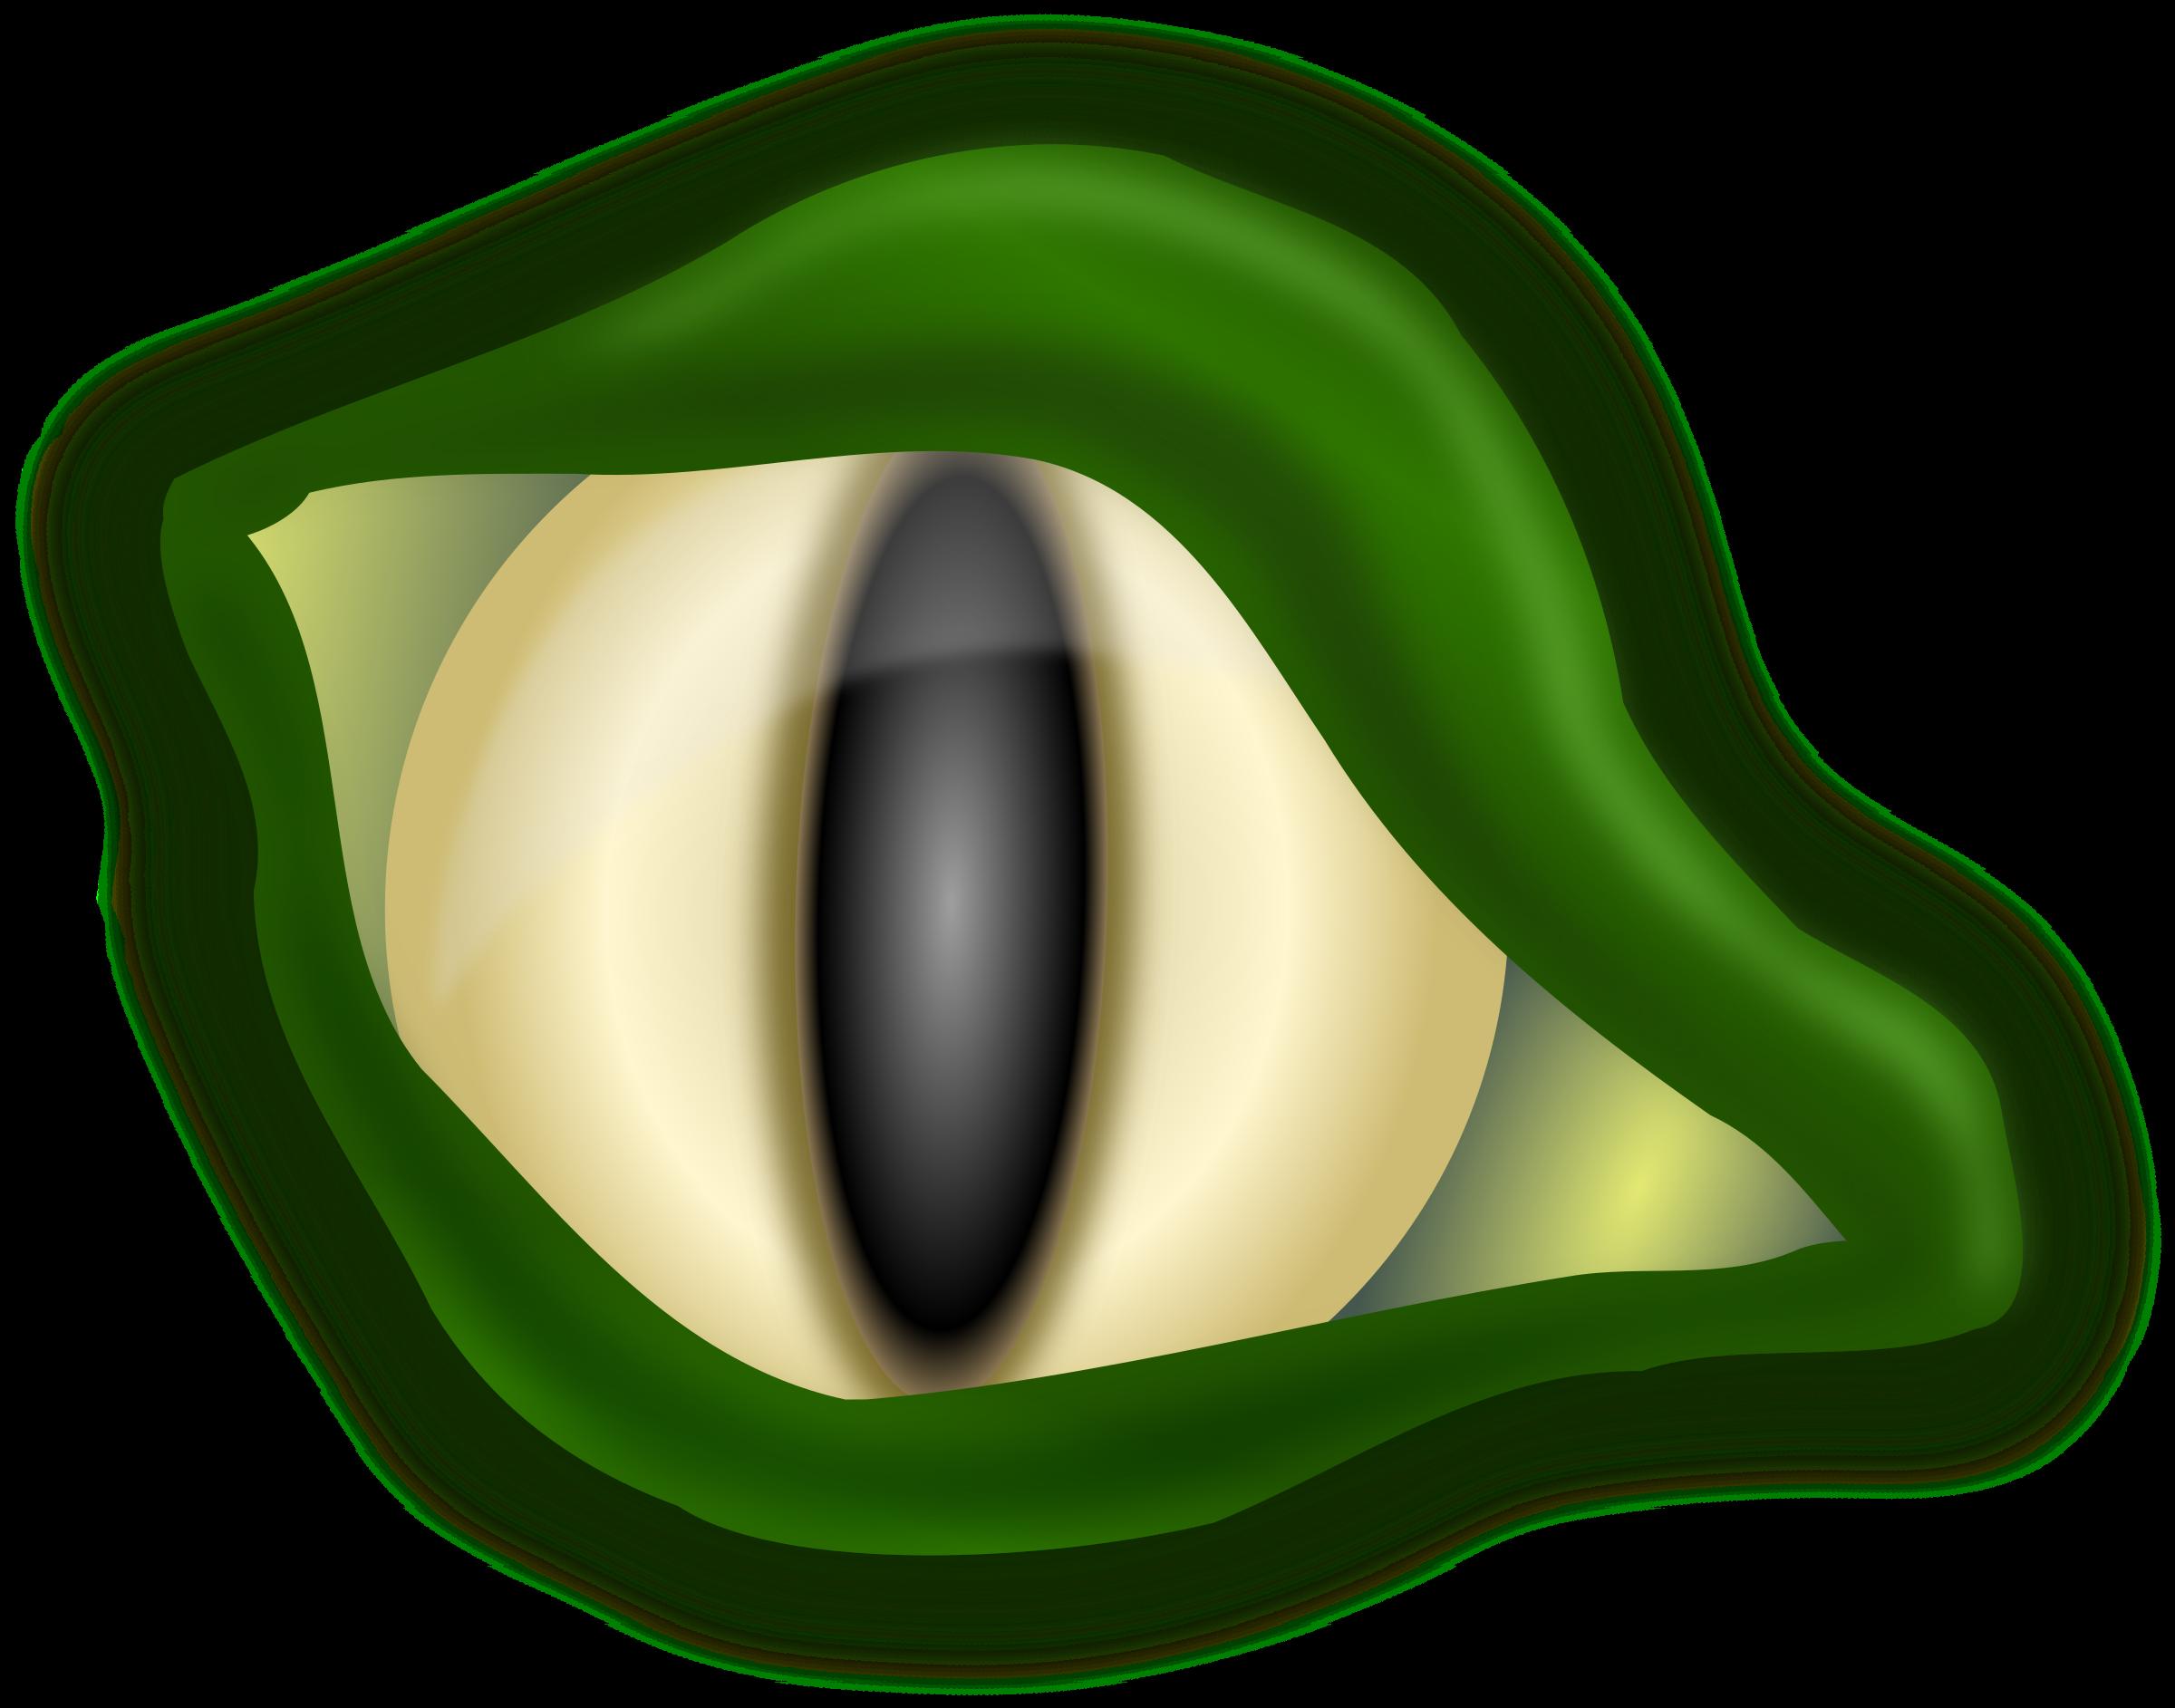 Gator clipart eyes, Gator eyes Transparent FREE for download.